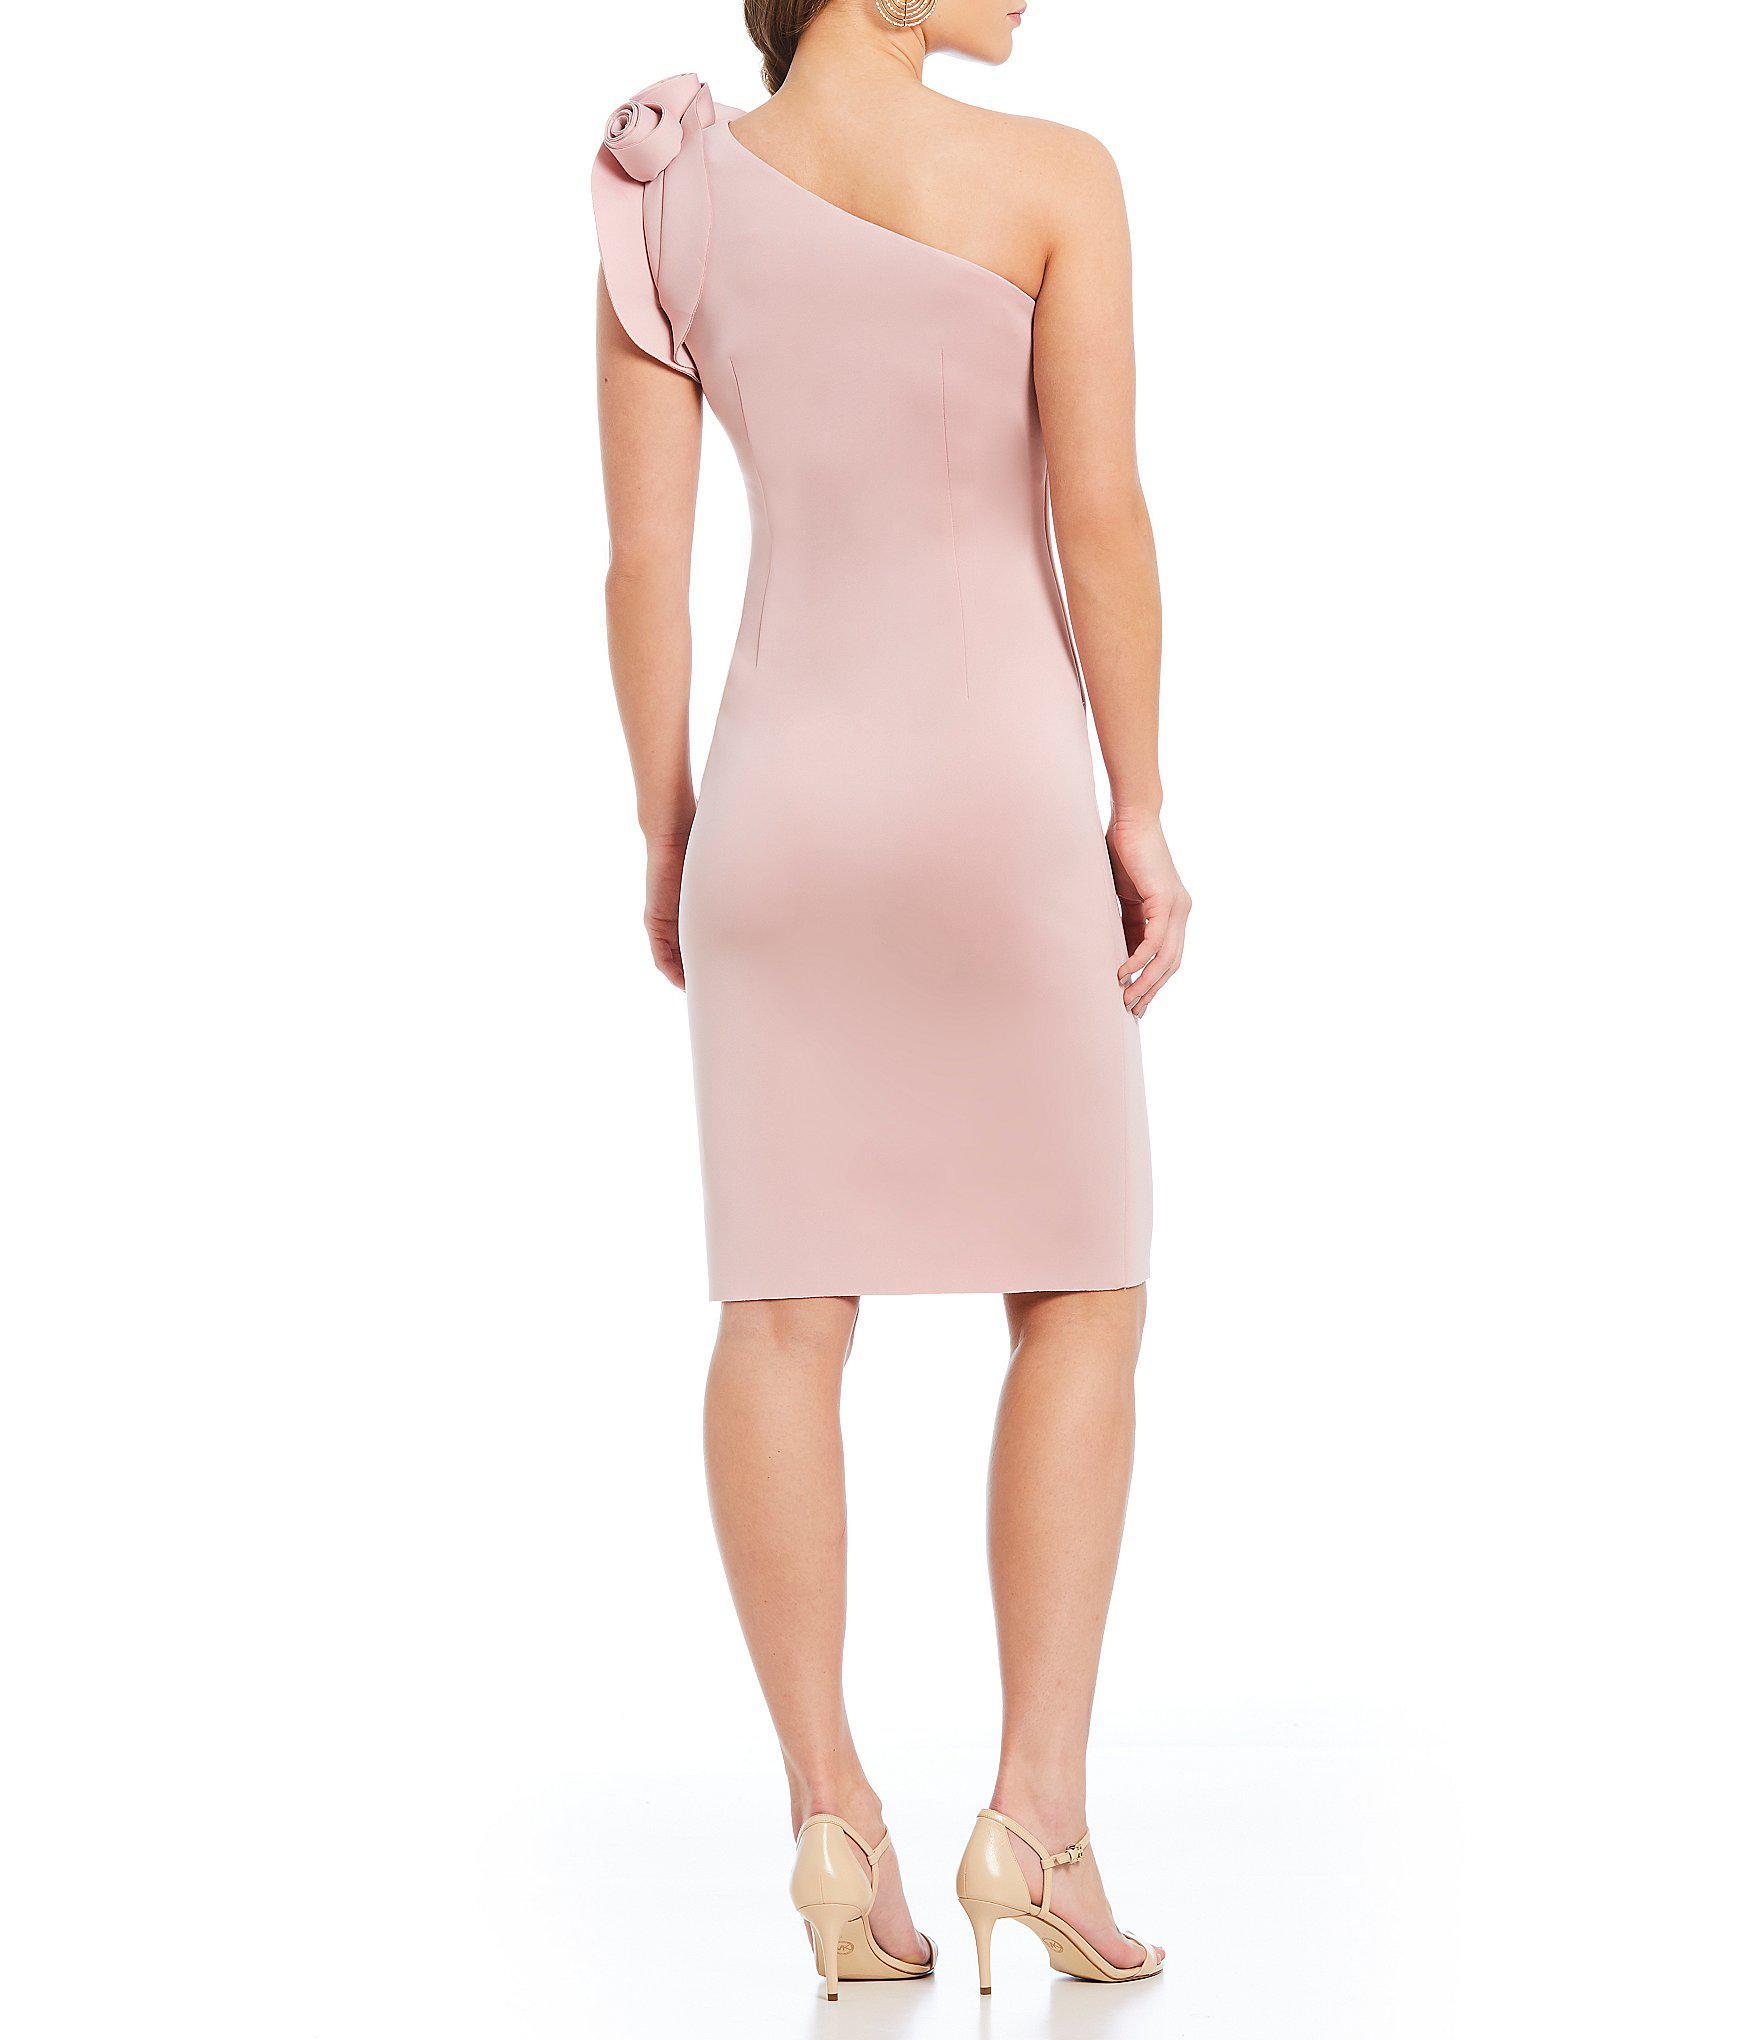 010e7ef72c9 Eliza J - Pink One Shoulder Ruffle Sleeve Sheath Dress - Lyst. View  fullscreen